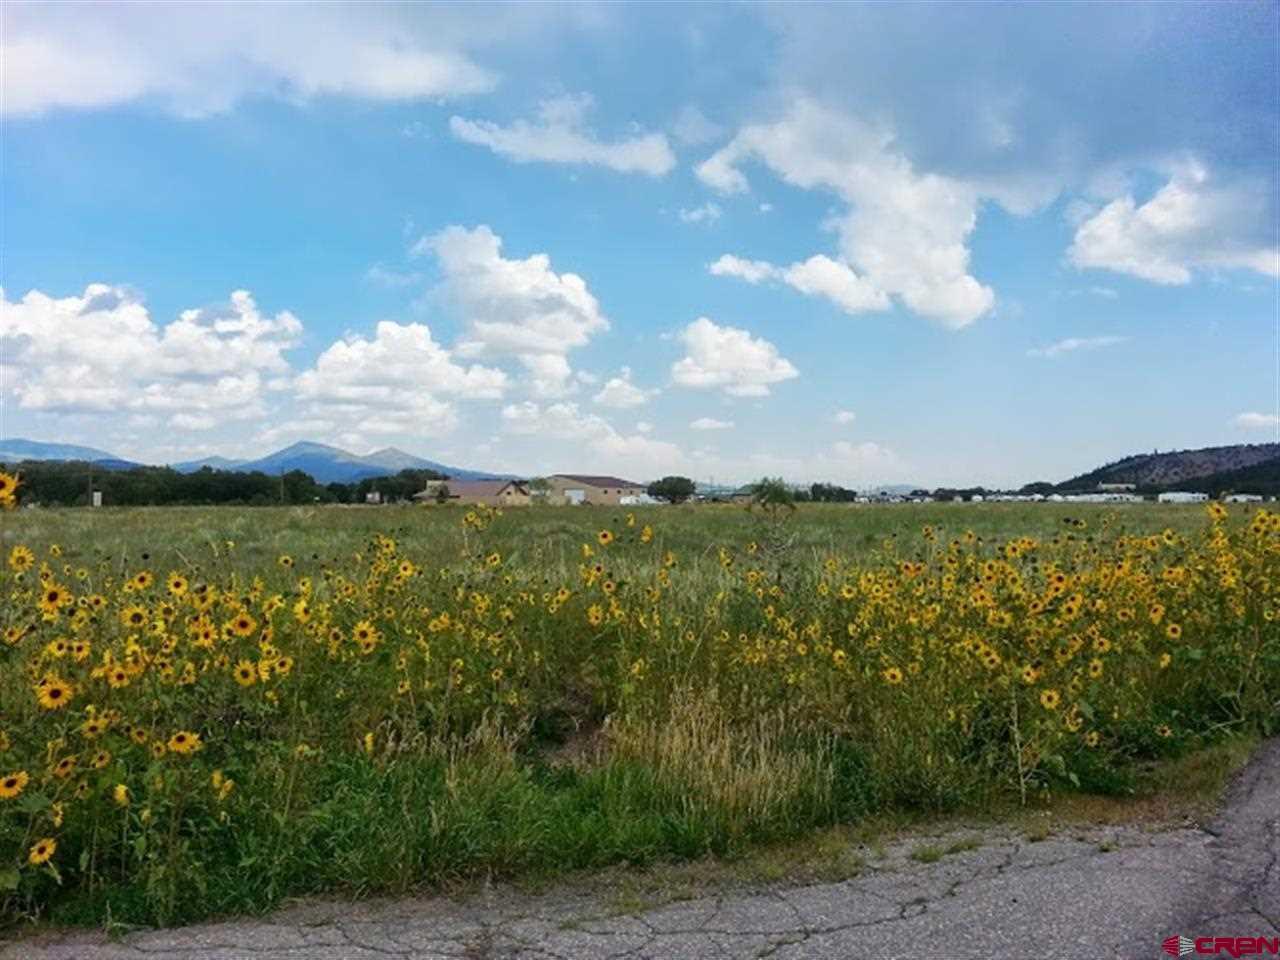 tbd Shoshone Trail, South Fork, Colorado 81154, ,Lots And Land,For Sale,tbd Shoshone Trail,774884